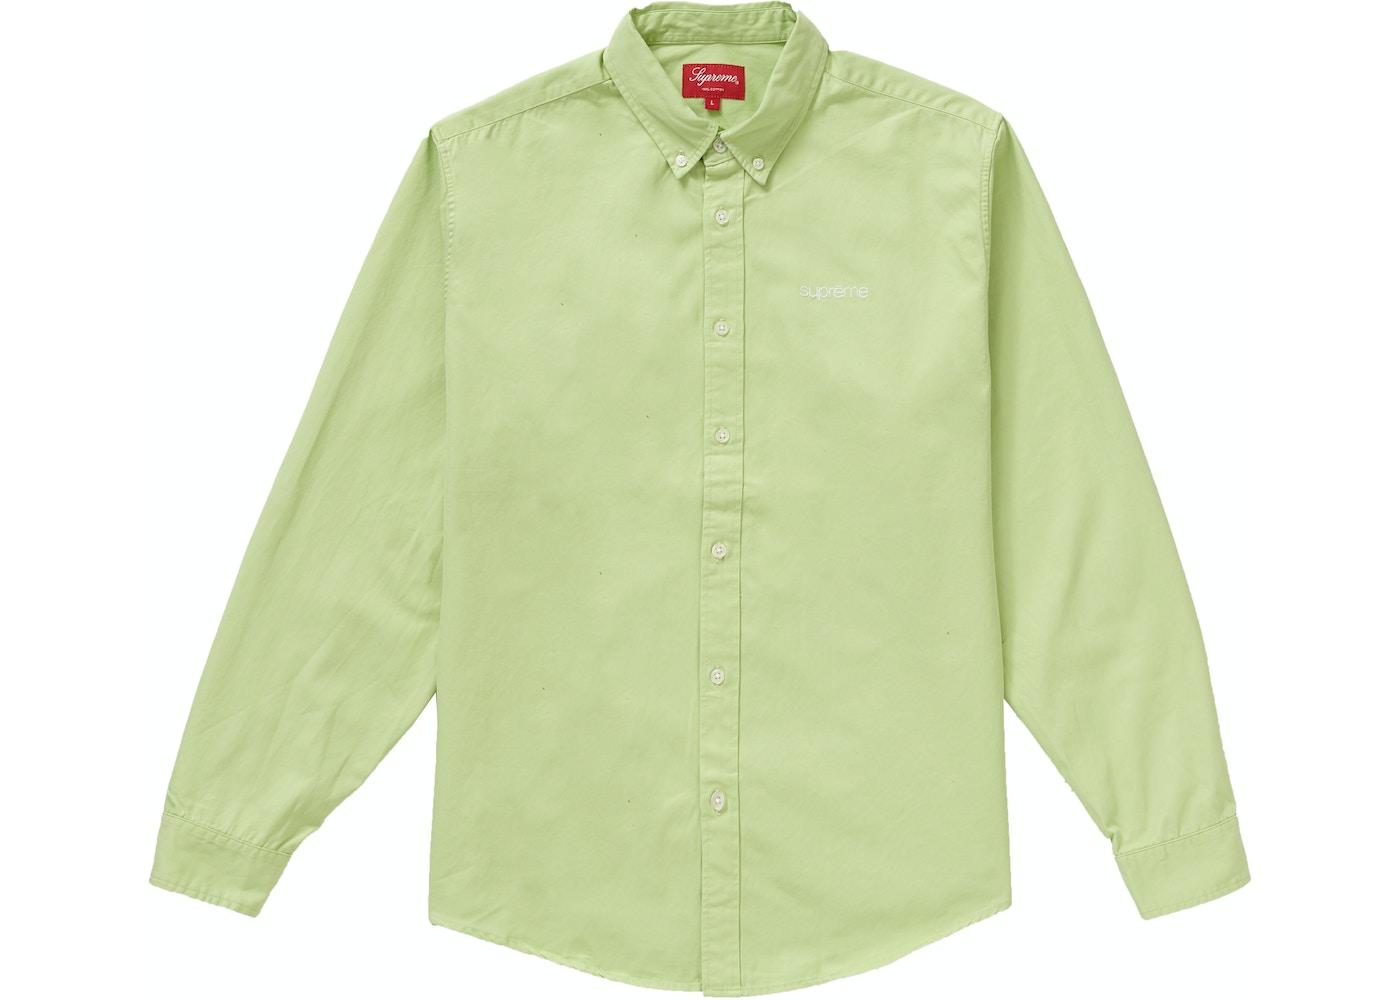 54cc24ed4ee6 Streetwear - Supreme Shirts - New Highest Bids